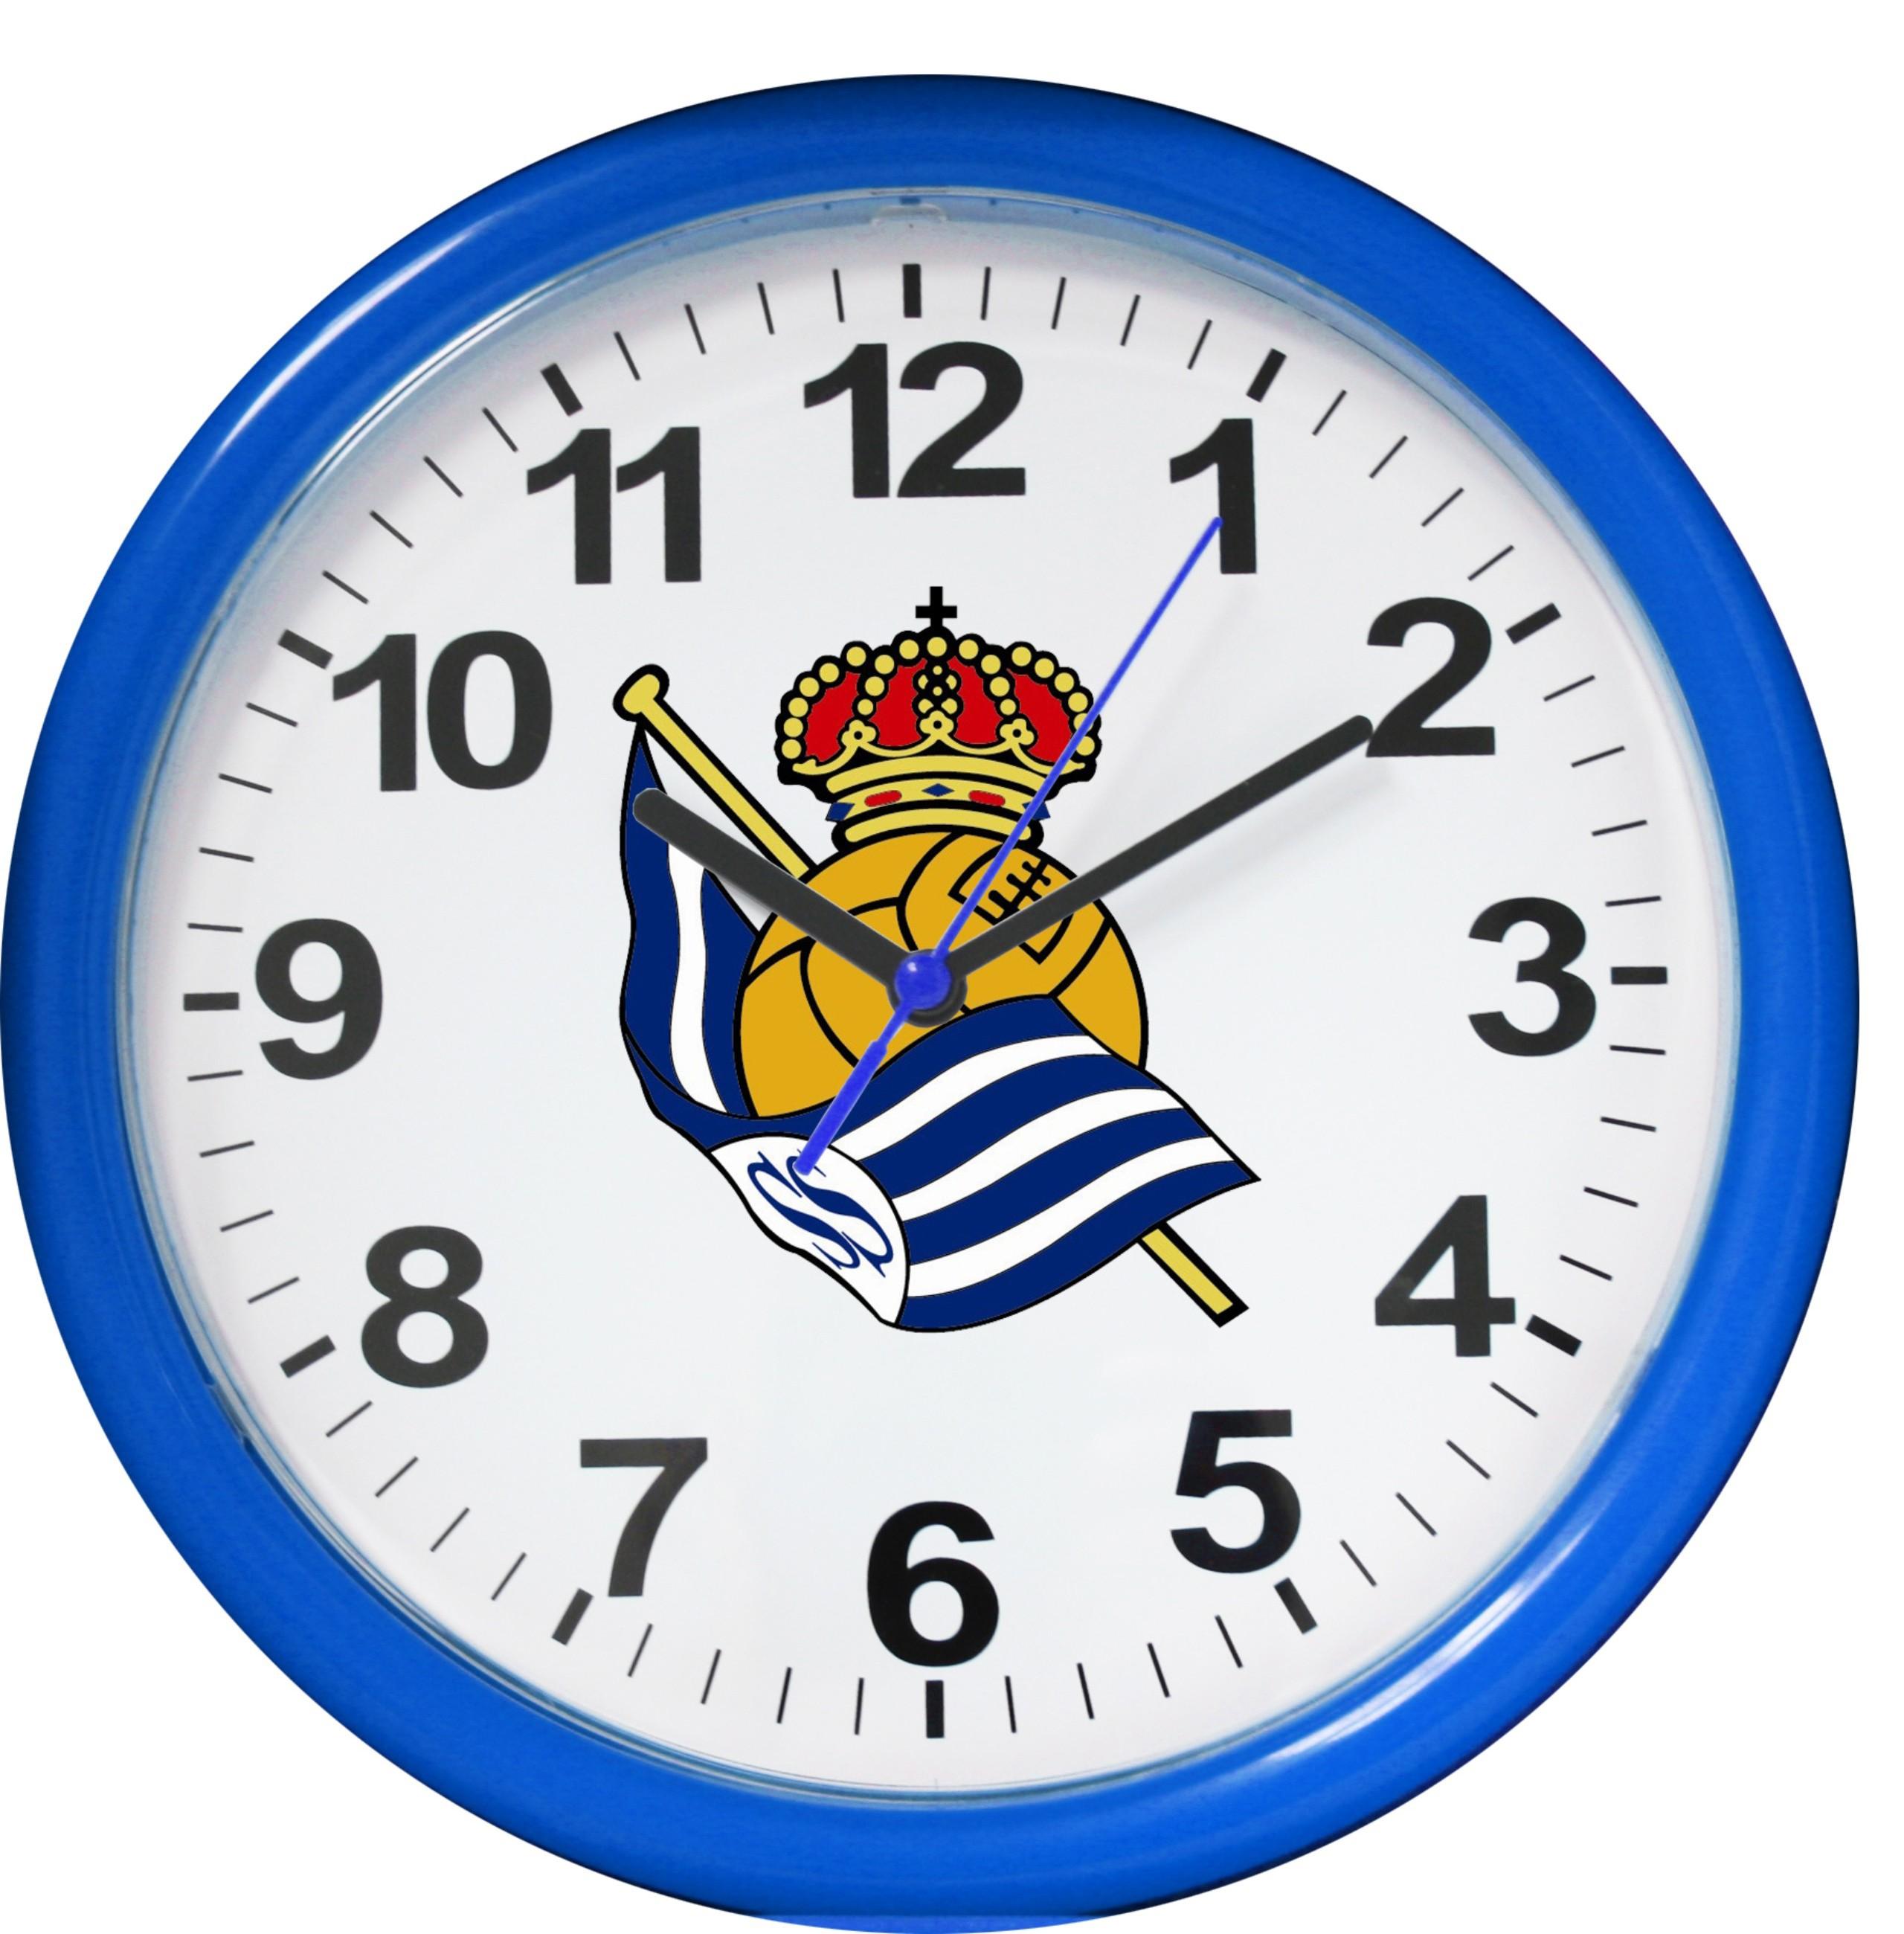 Imagenes de relojes de pared imagenes de relojes de pared - Relojes para decorar paredes ...